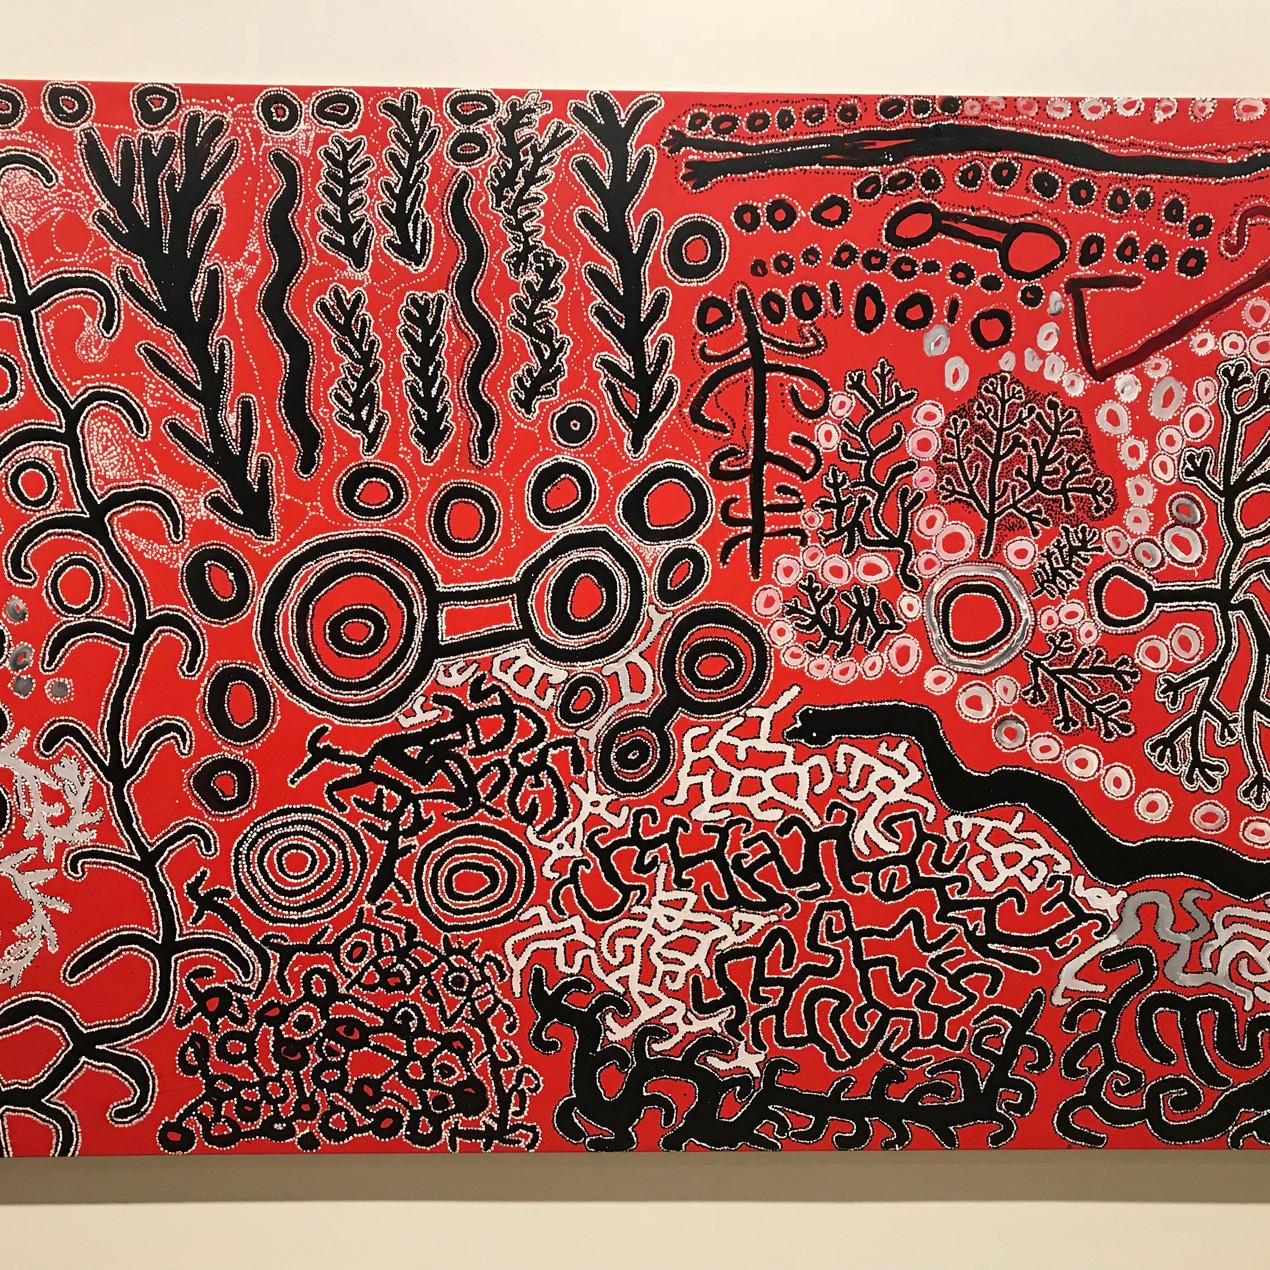 Pintupi painting at AGNSW